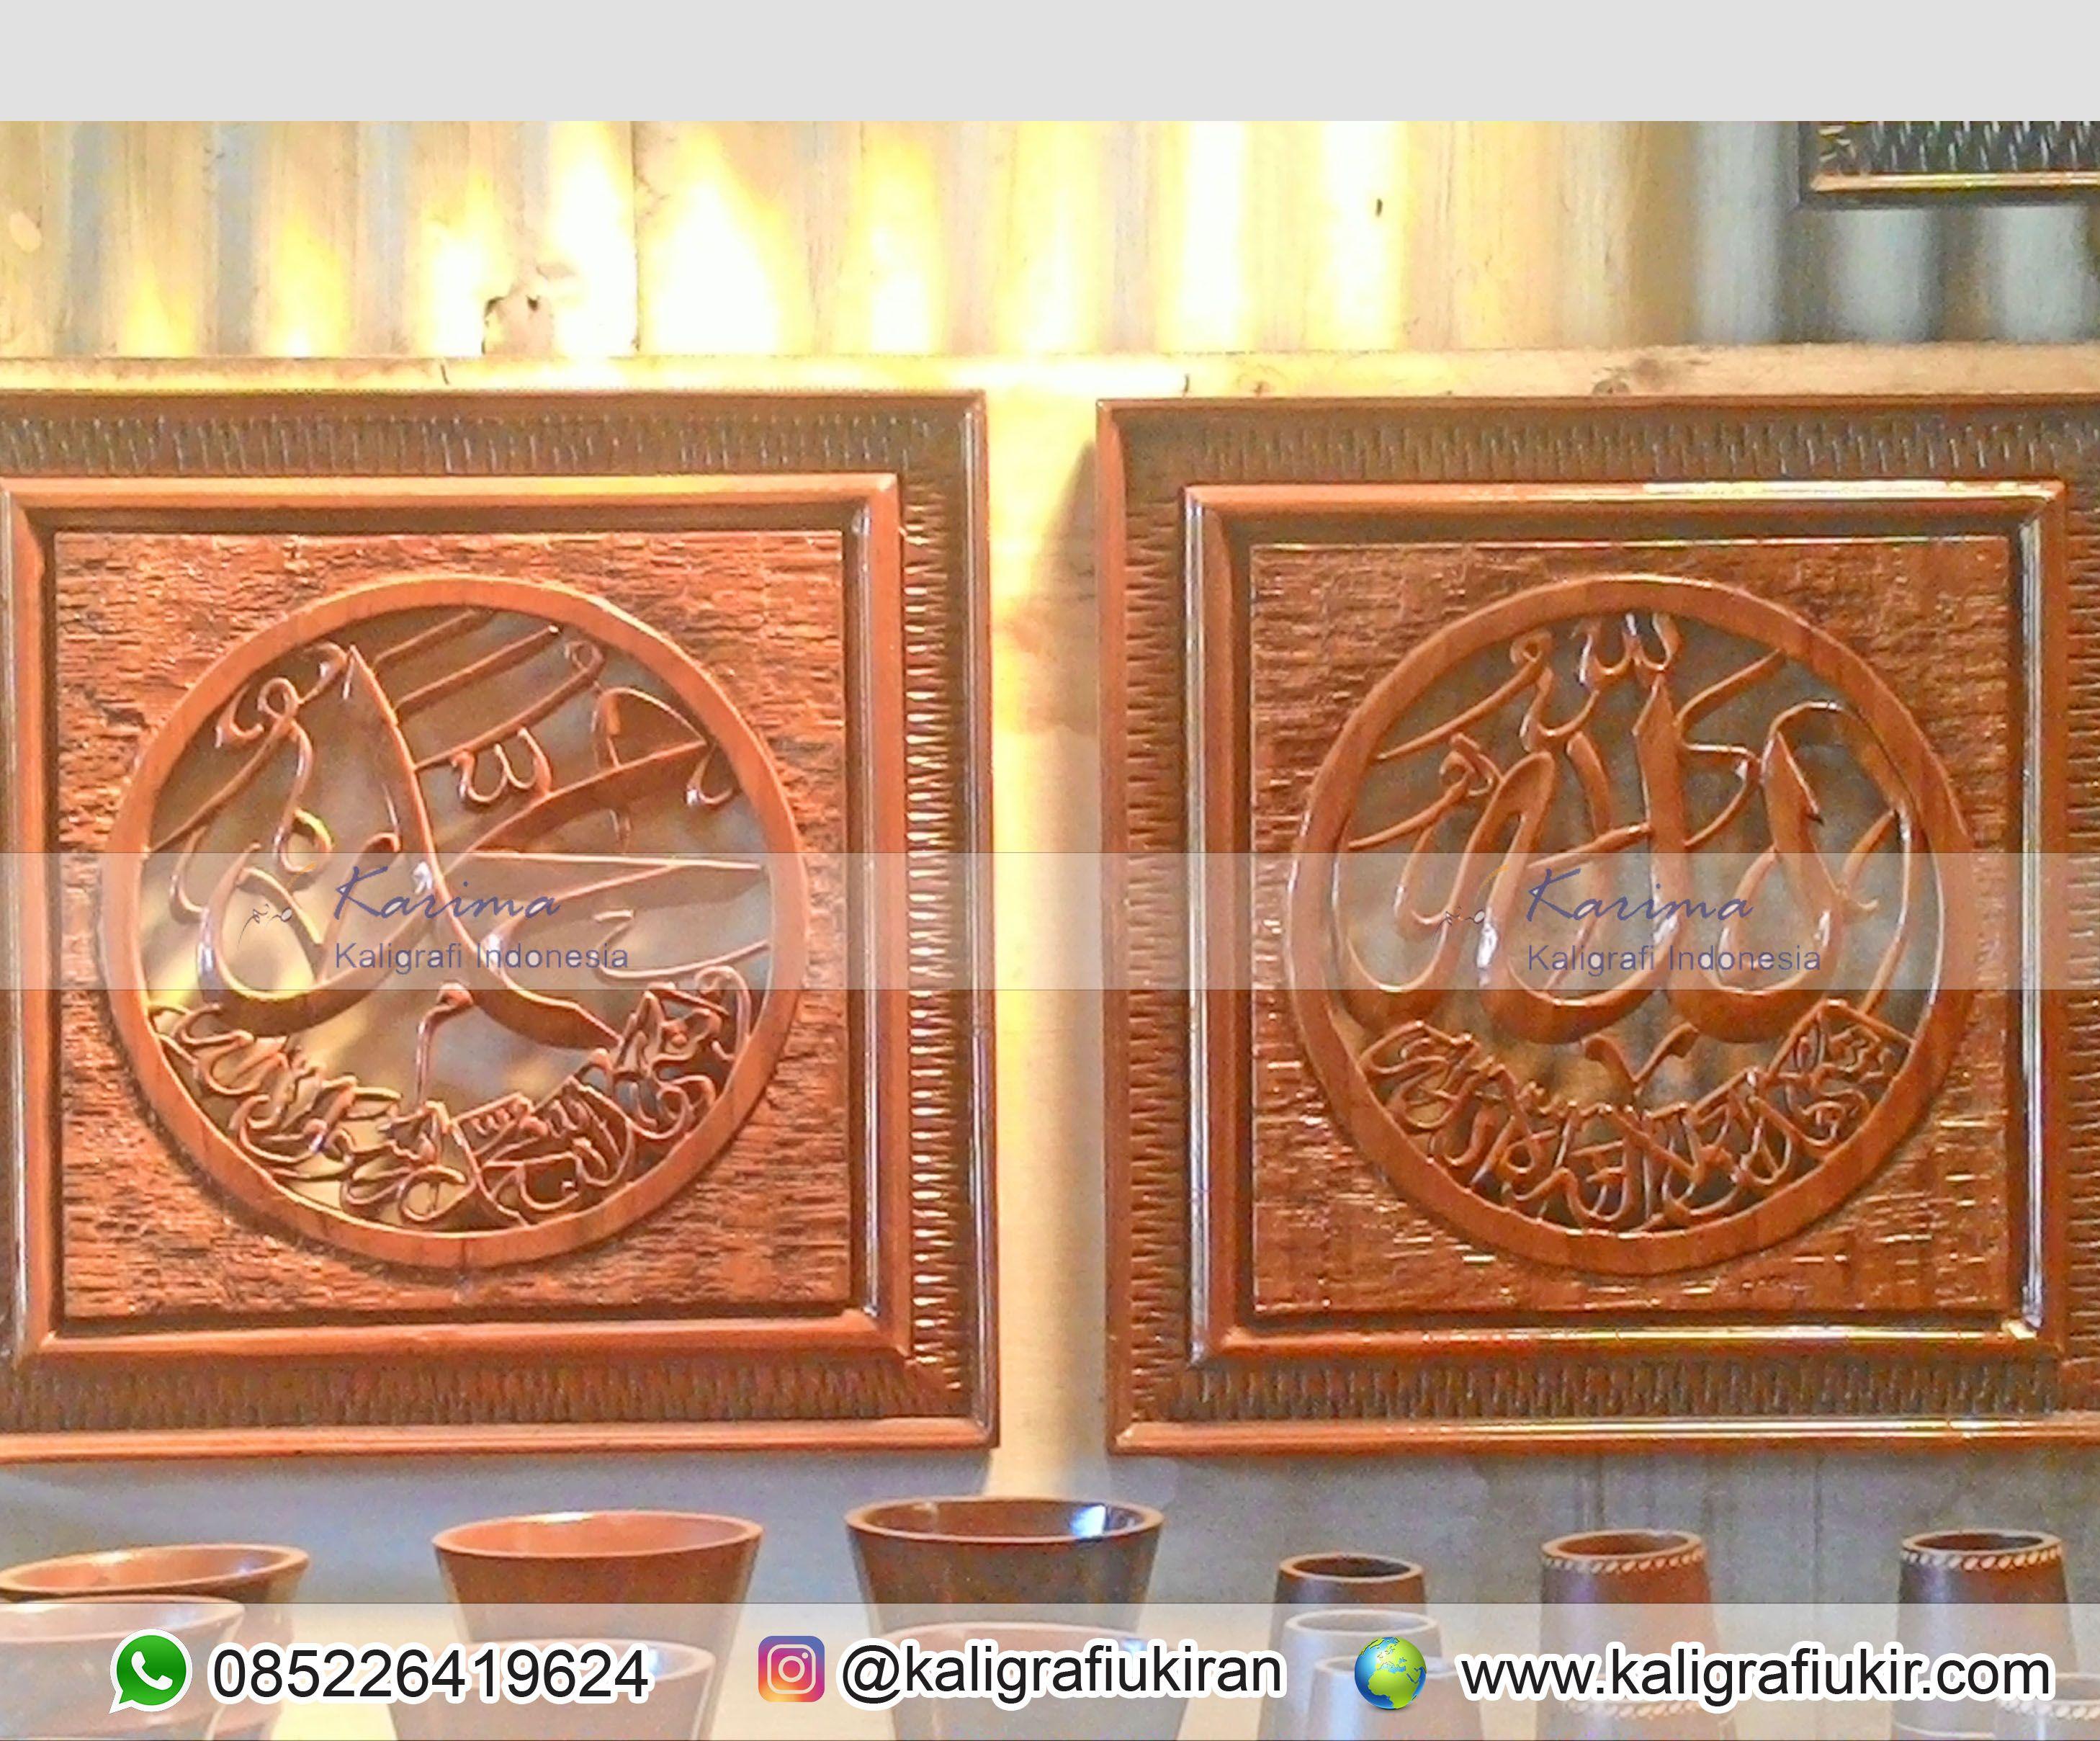 Pin di Kaligrafi Allah Muhammad